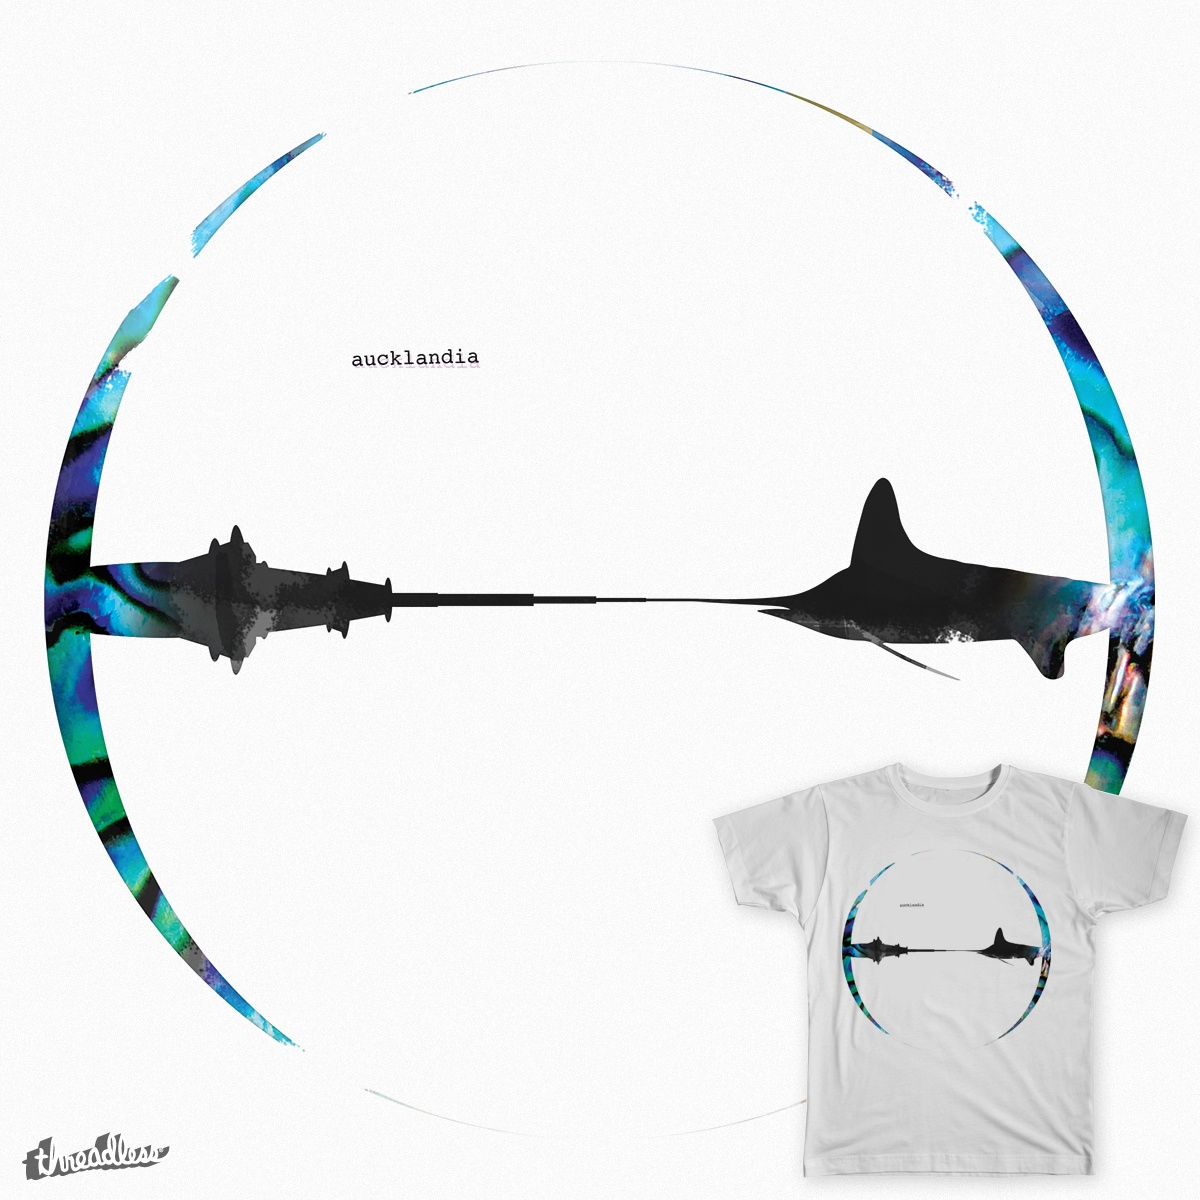 Aucklandia, a cool t-shirt design